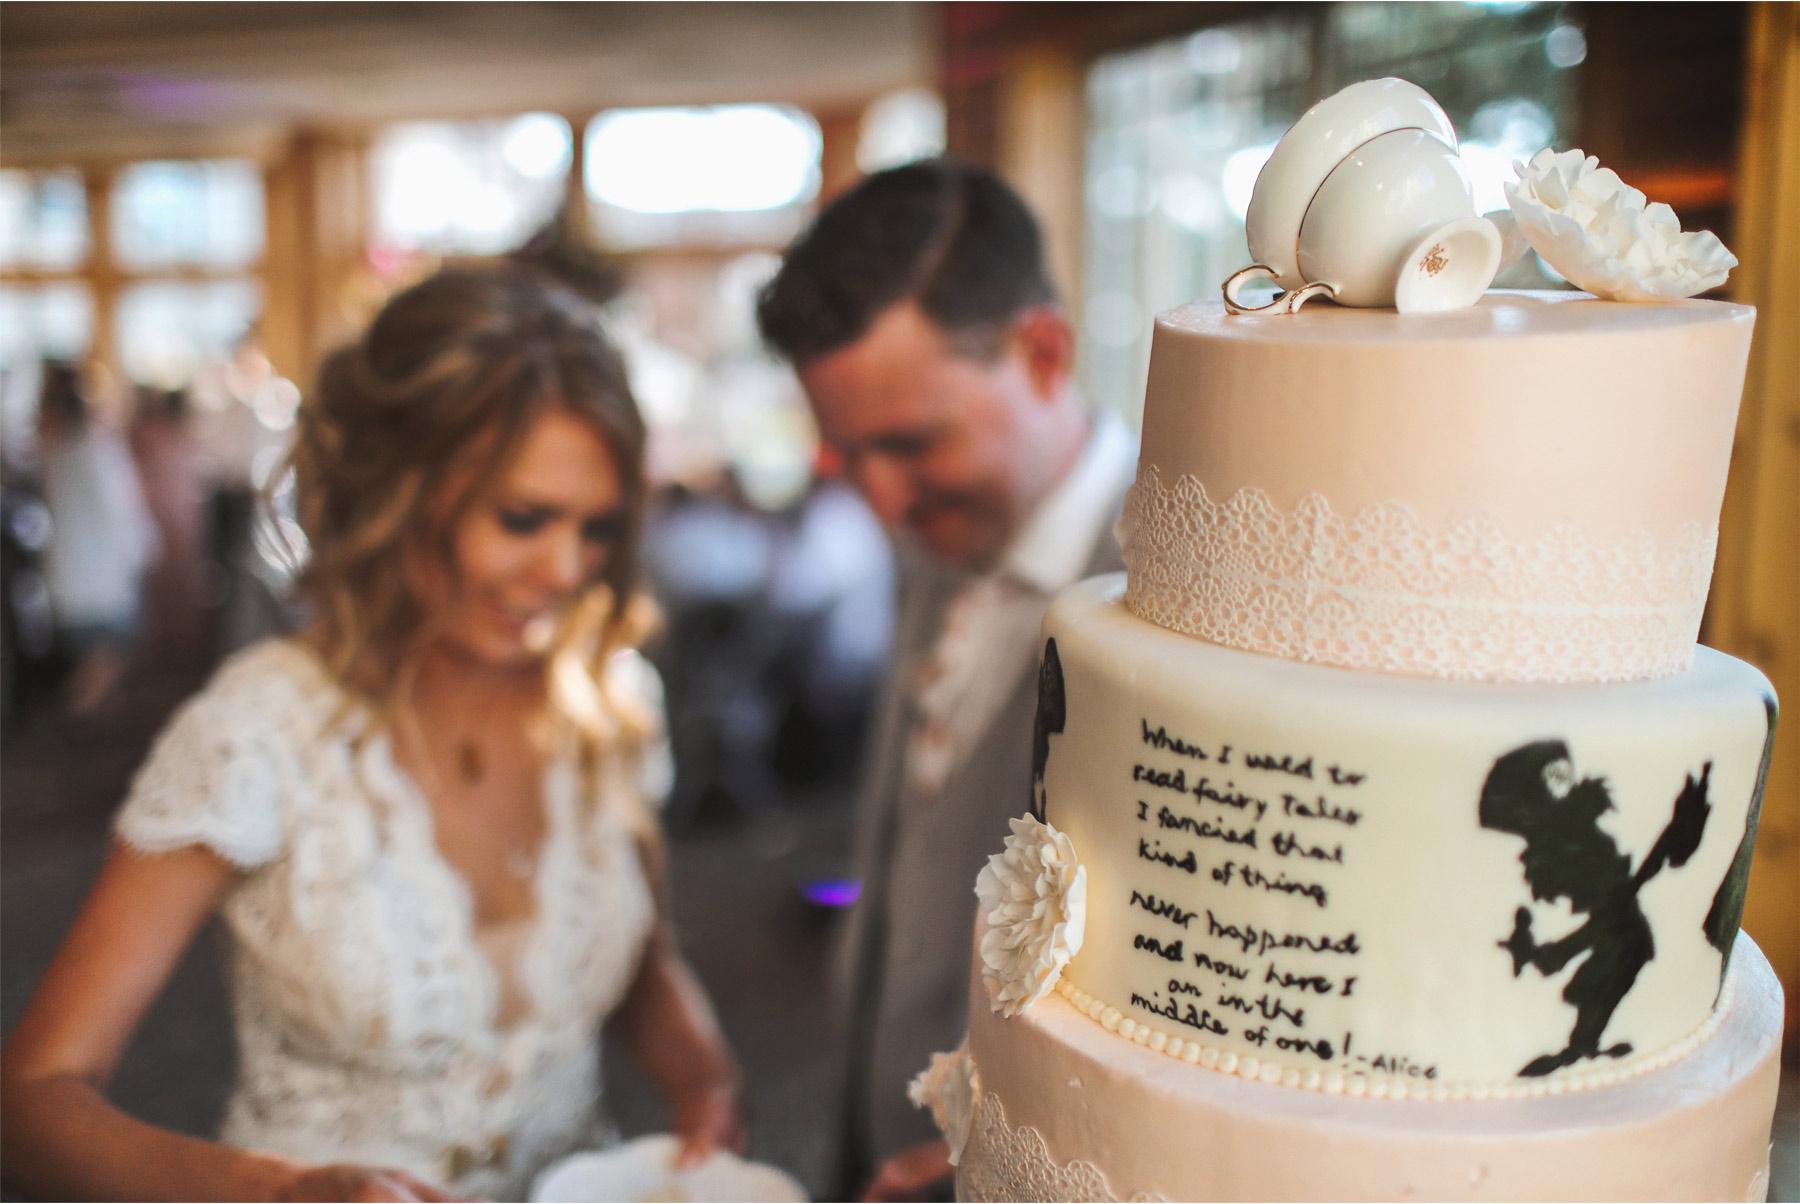 22-Vick-Photography-Wedding-Ottertail-Minnesota-Alice-in-Wonderland-Theme-Reception-Cake-Cutting-Bride-Groom-Rabit-Tess-and-Greg.jpg